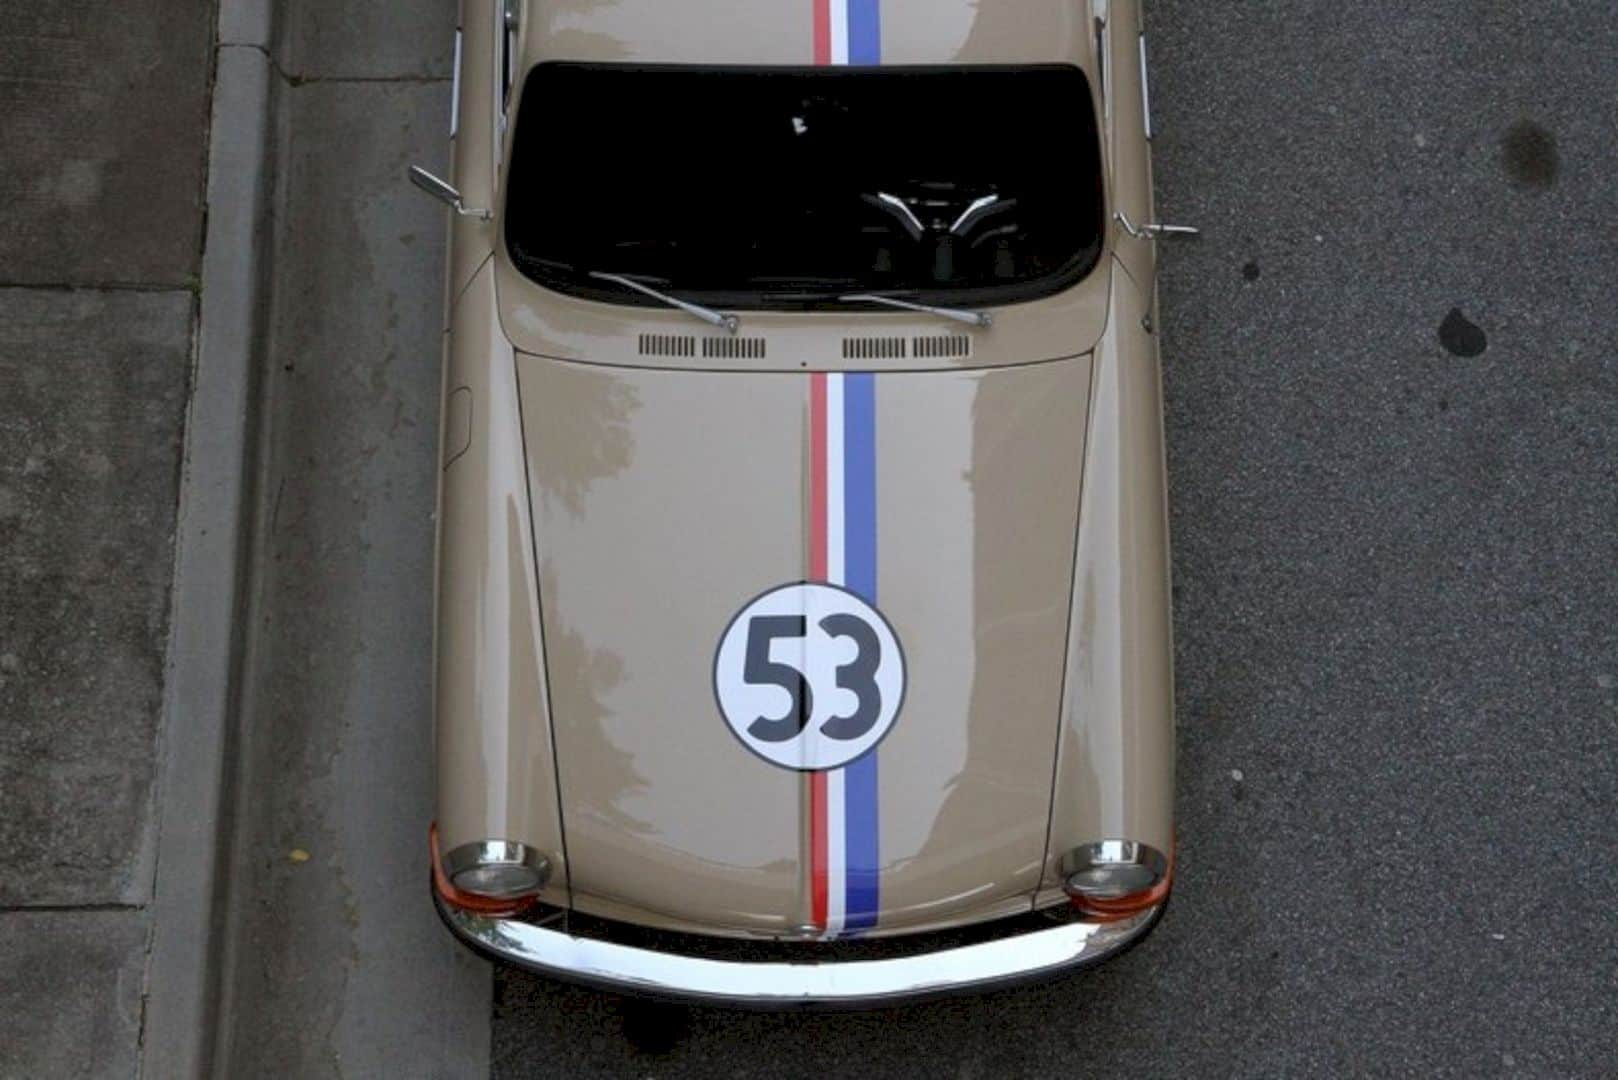 1972 Volkswagen Type 3 Squareback 5